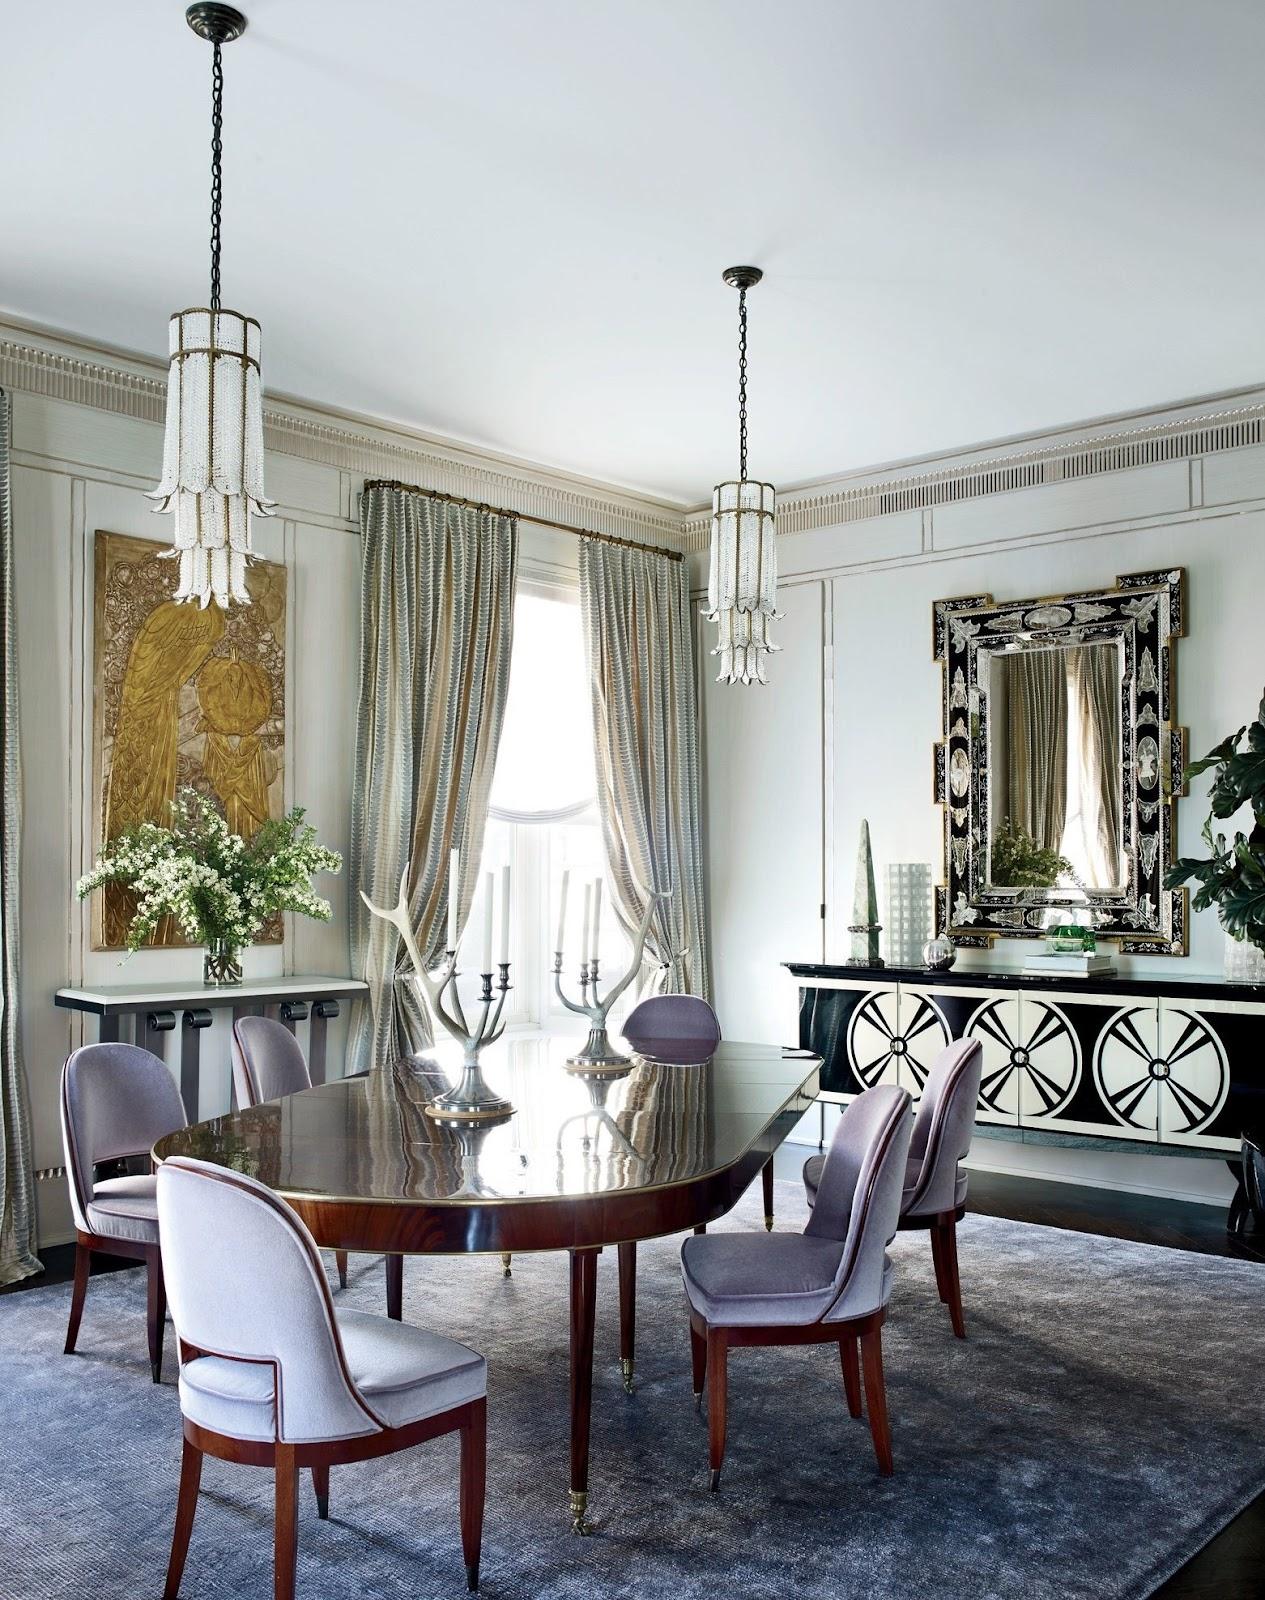 Inspirasi hunian dengan desain interior art deco - source: architecturaldigest.com